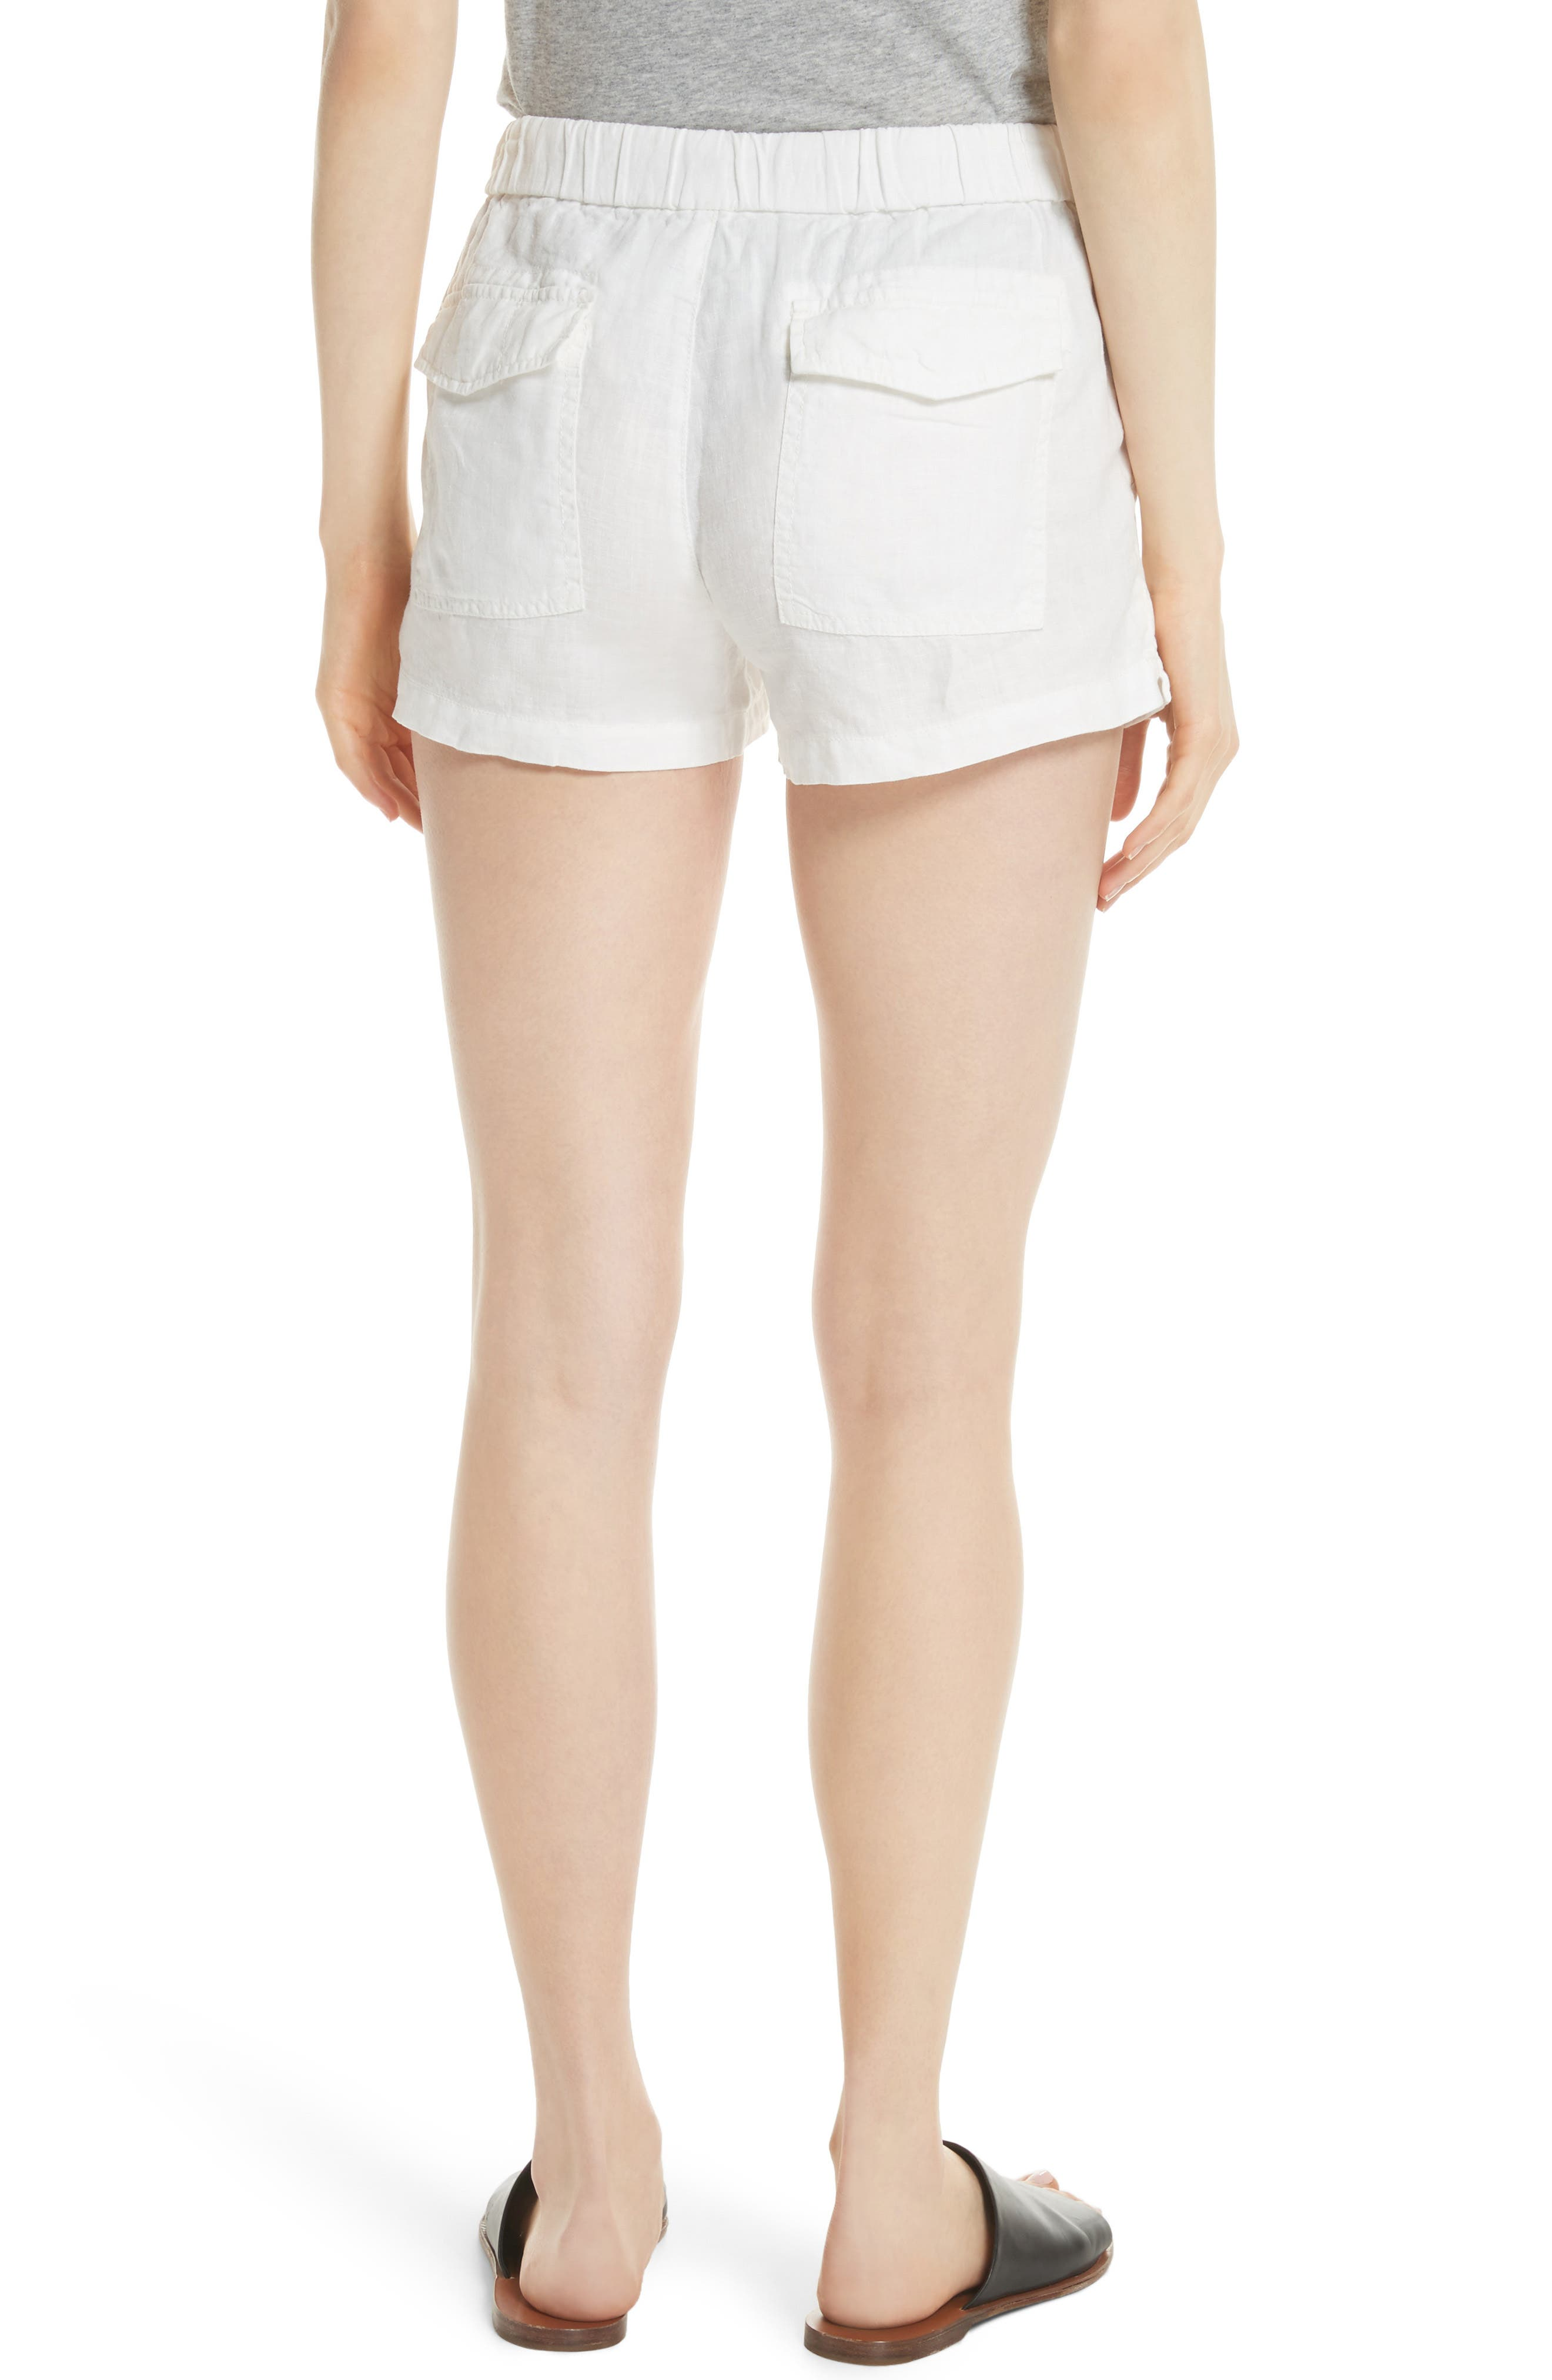 Fosette Linen Drawstring Shorts,                             Alternate thumbnail 2, color,                             Porcelain